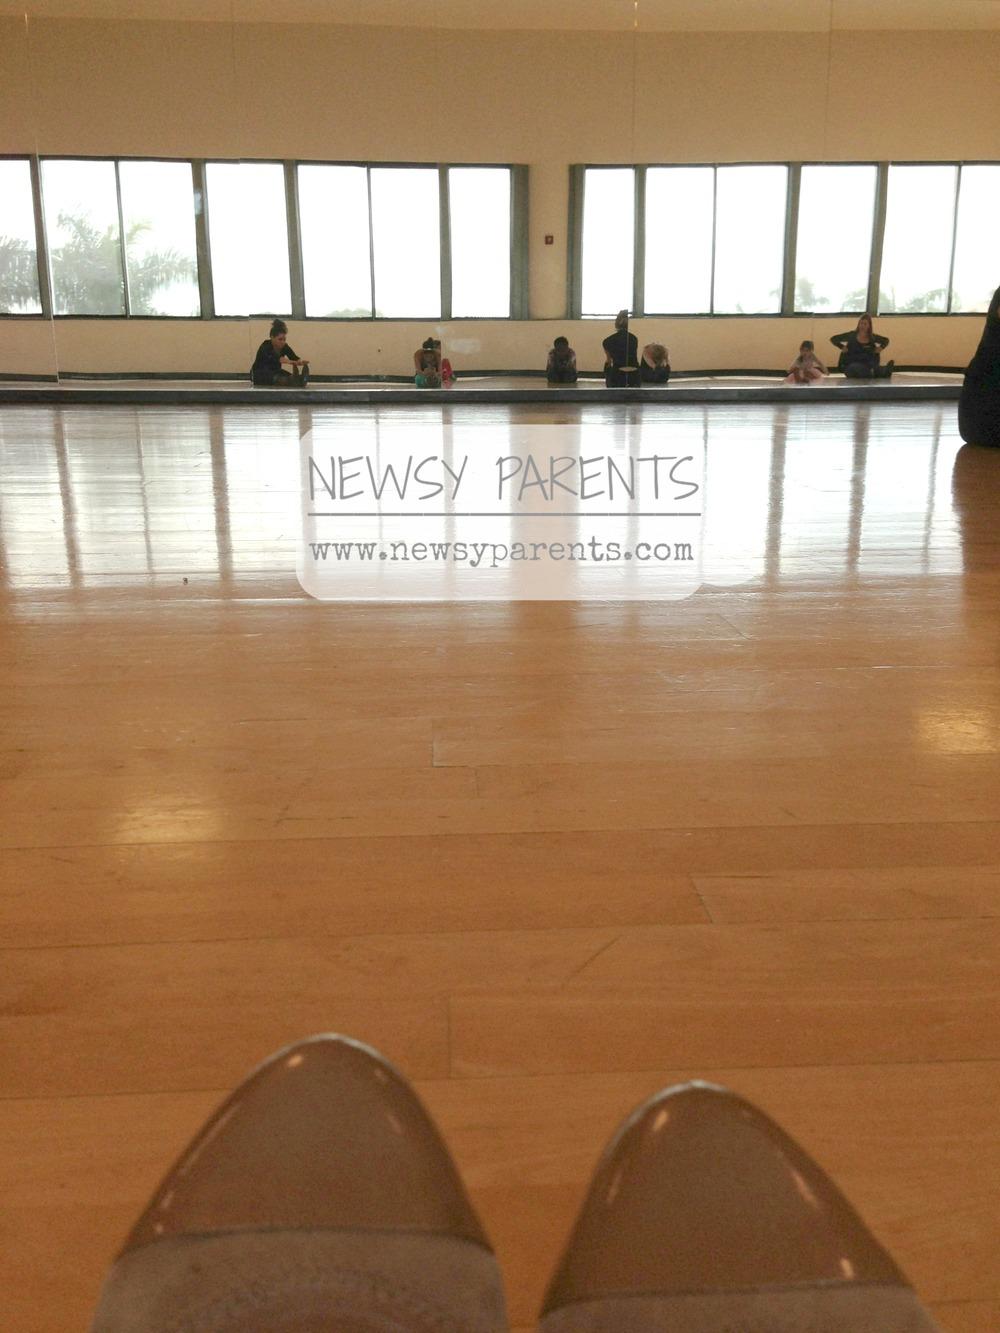 Newsy Parents Rockettes kick class shoes